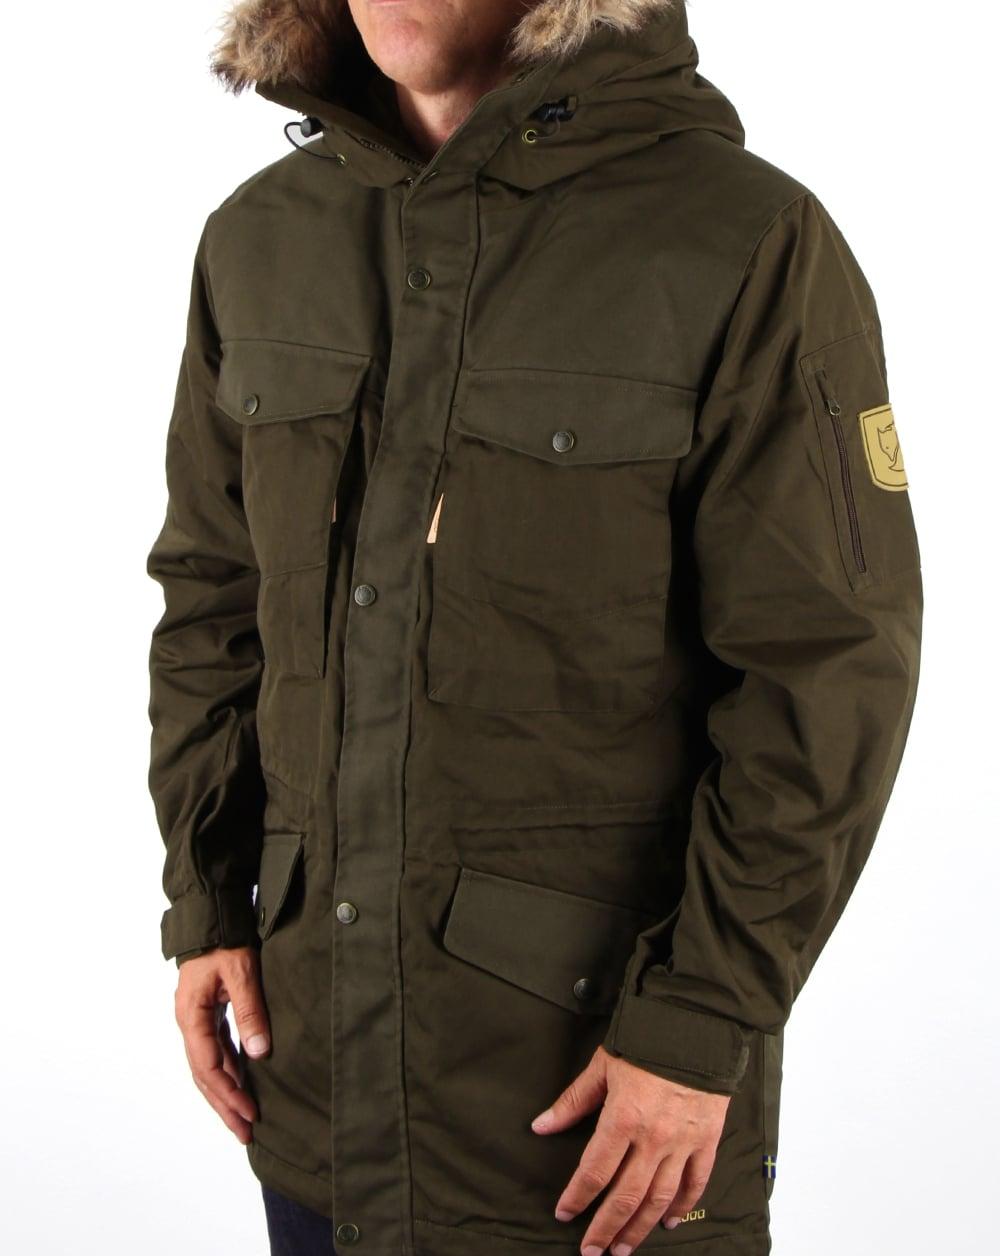 Patagonia Winter Jackets